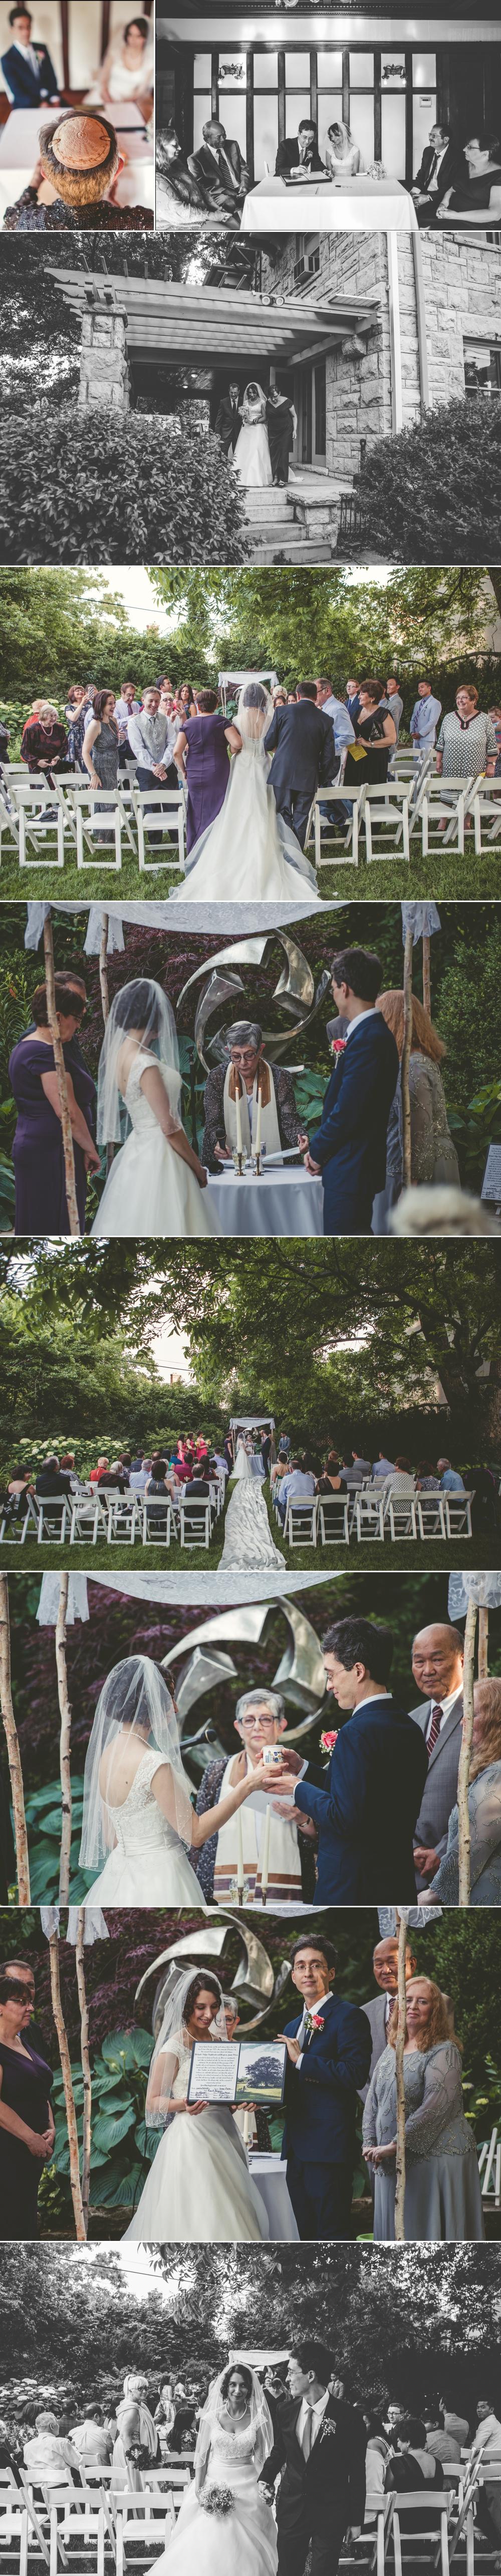 jason_domingues_photography_best_kansas_city_photographer_kc_weddings_simpson_house_0002.jpg